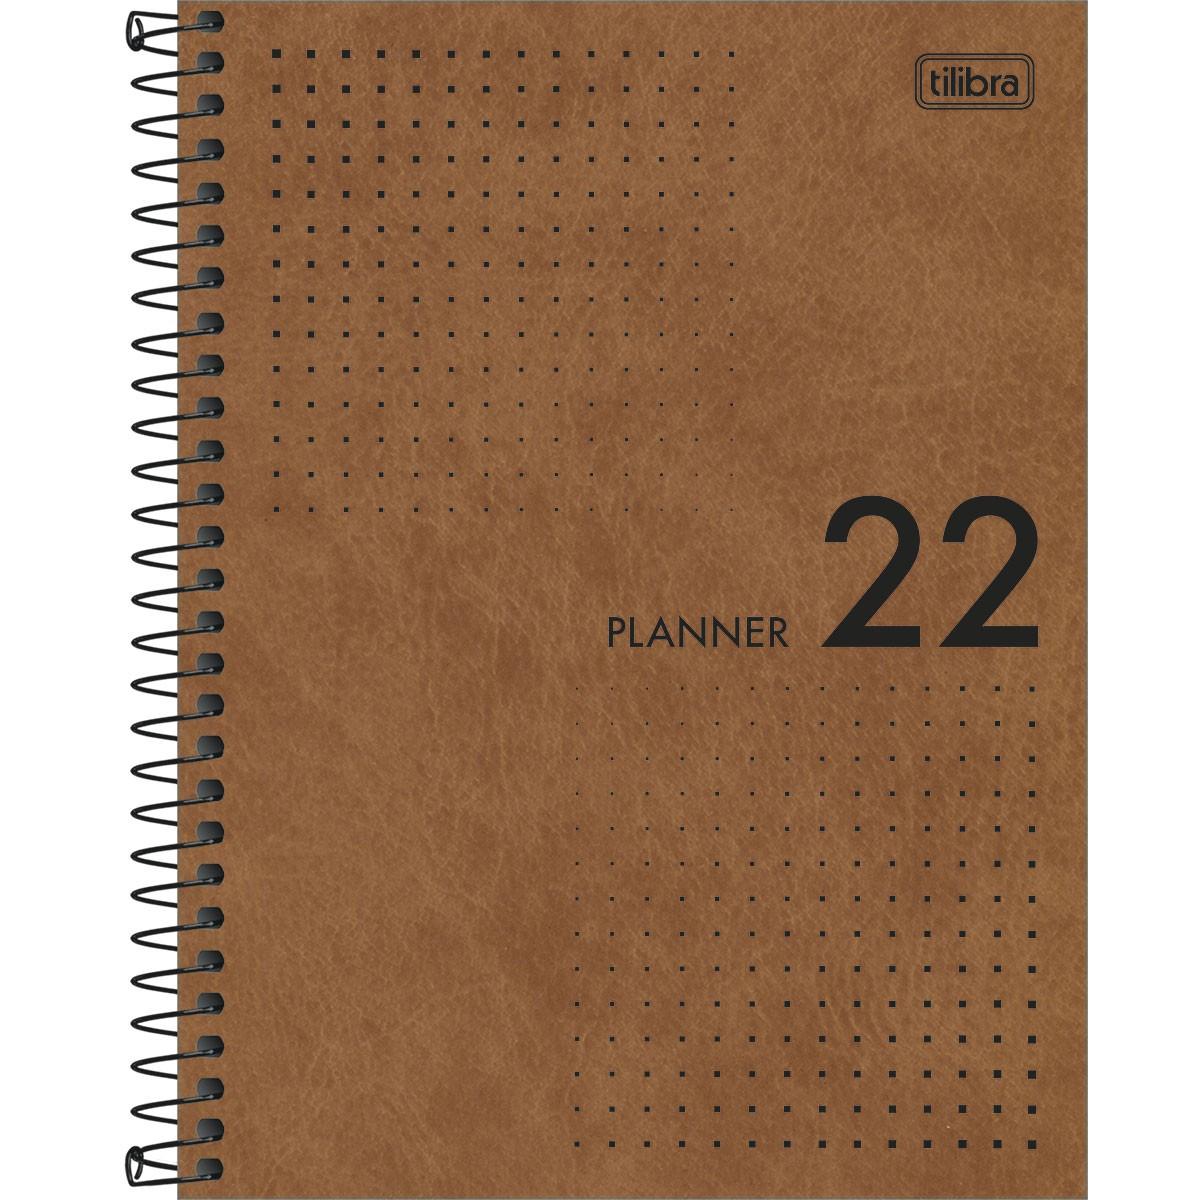 Planner Pratika 2022 - Tilibra